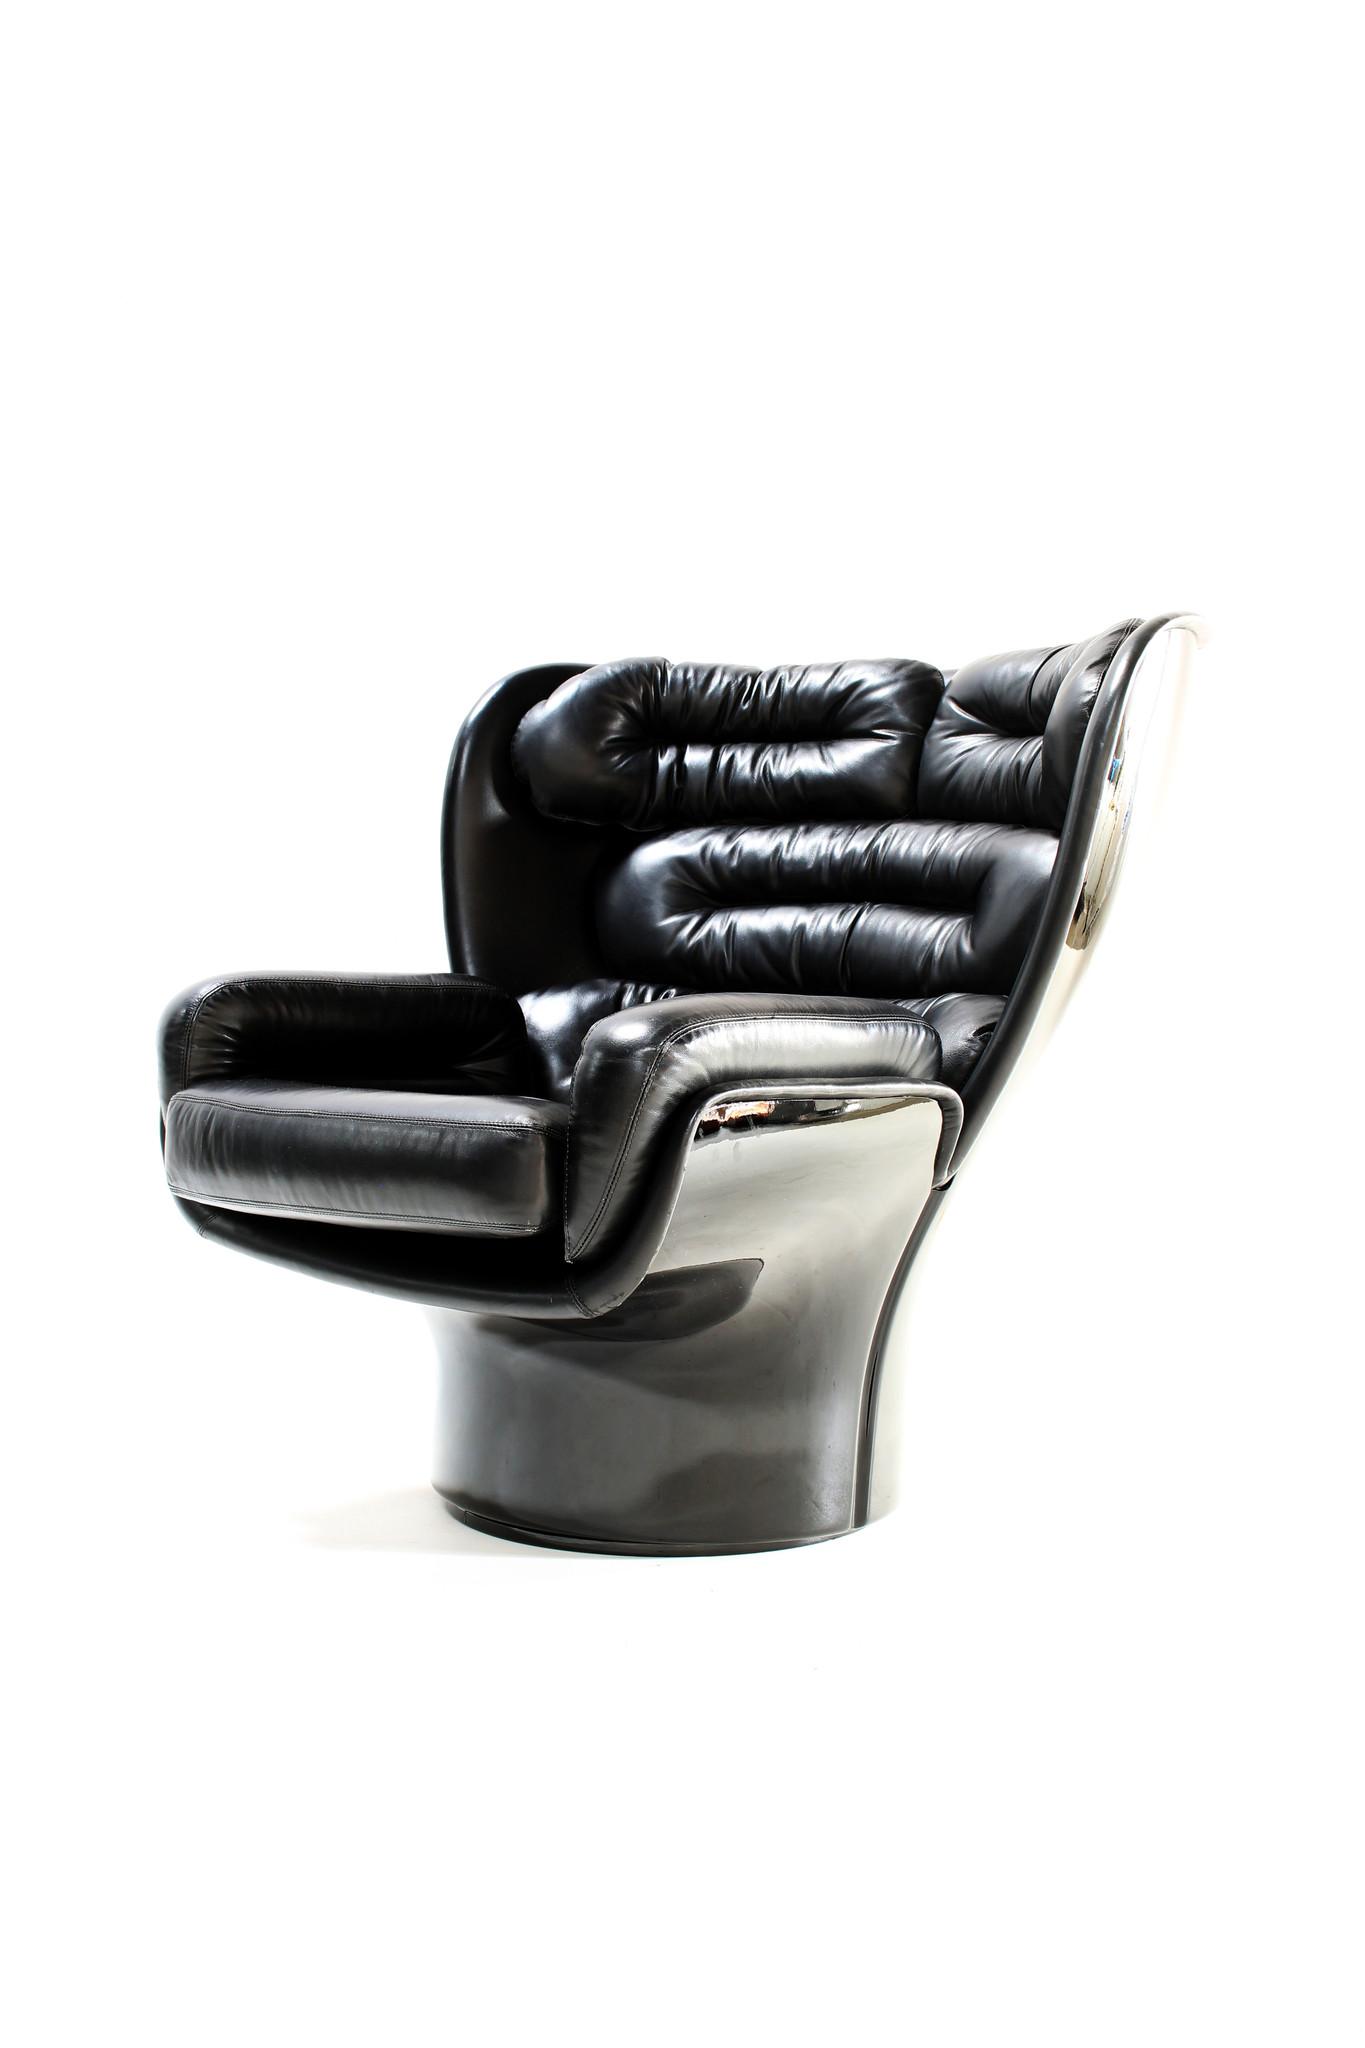 Rare Full Black Edition Elda Chair designed by Joe Colombo for Comfort, 1963